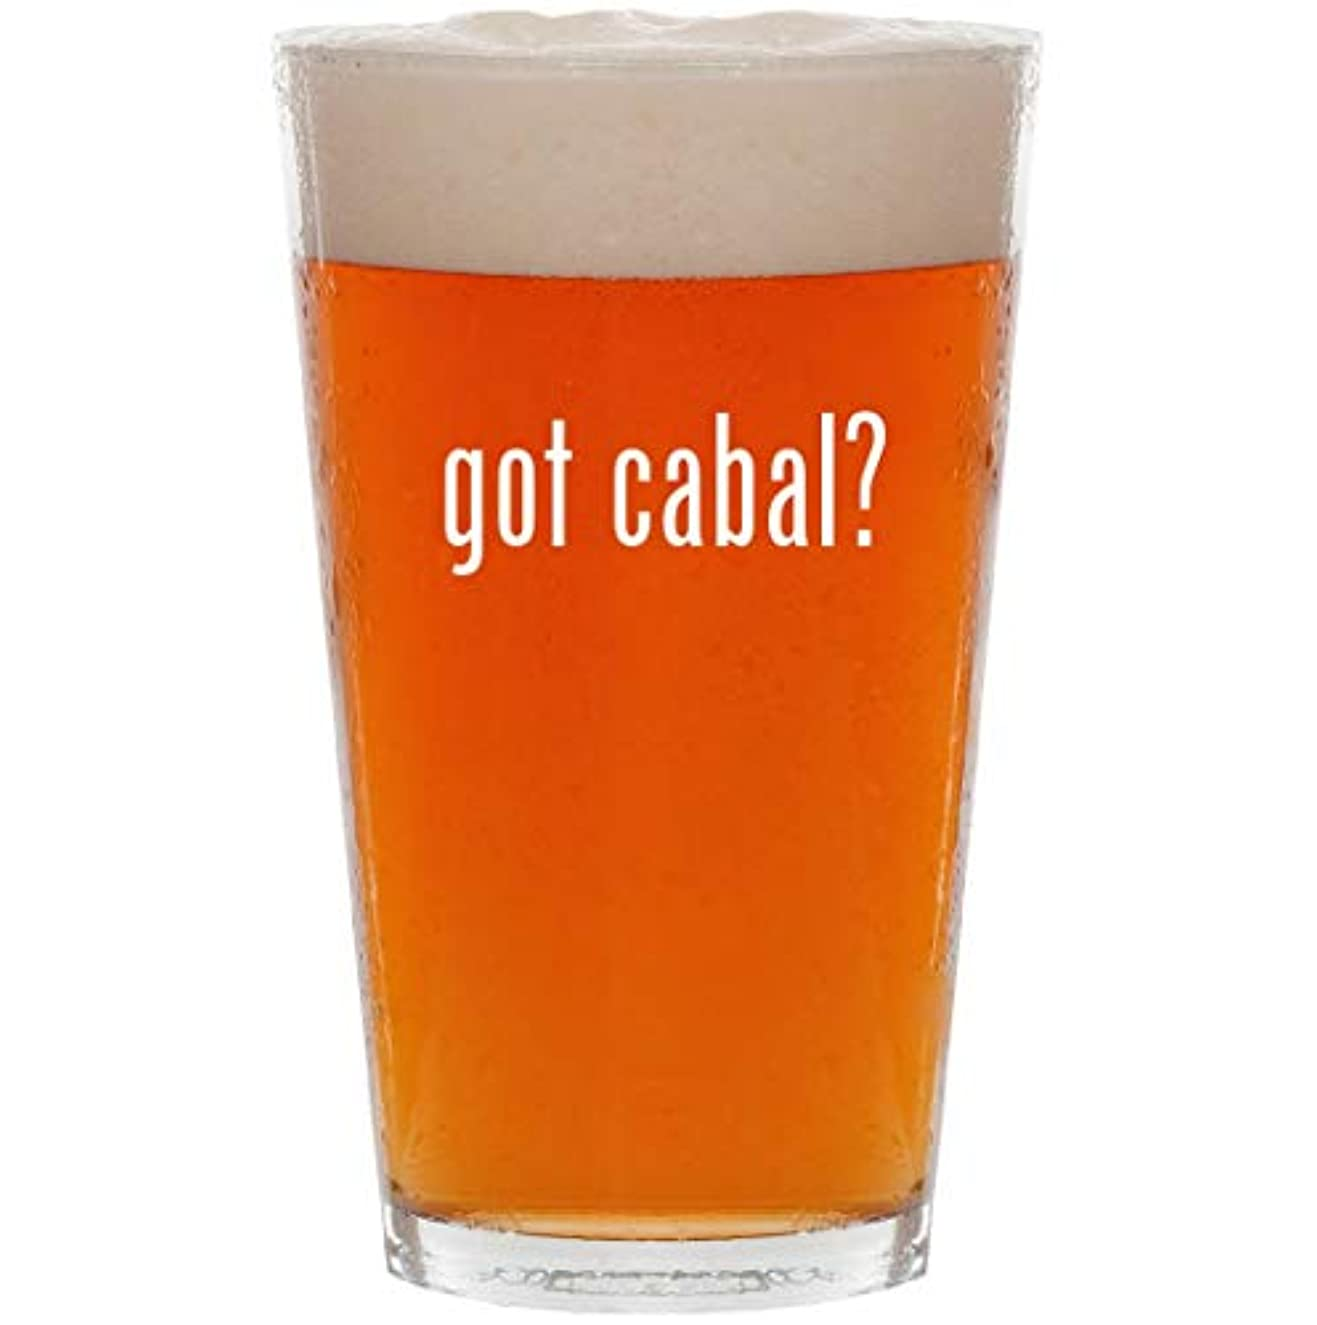 got cabal? - 16oz All Purpose Pint Beer Glass